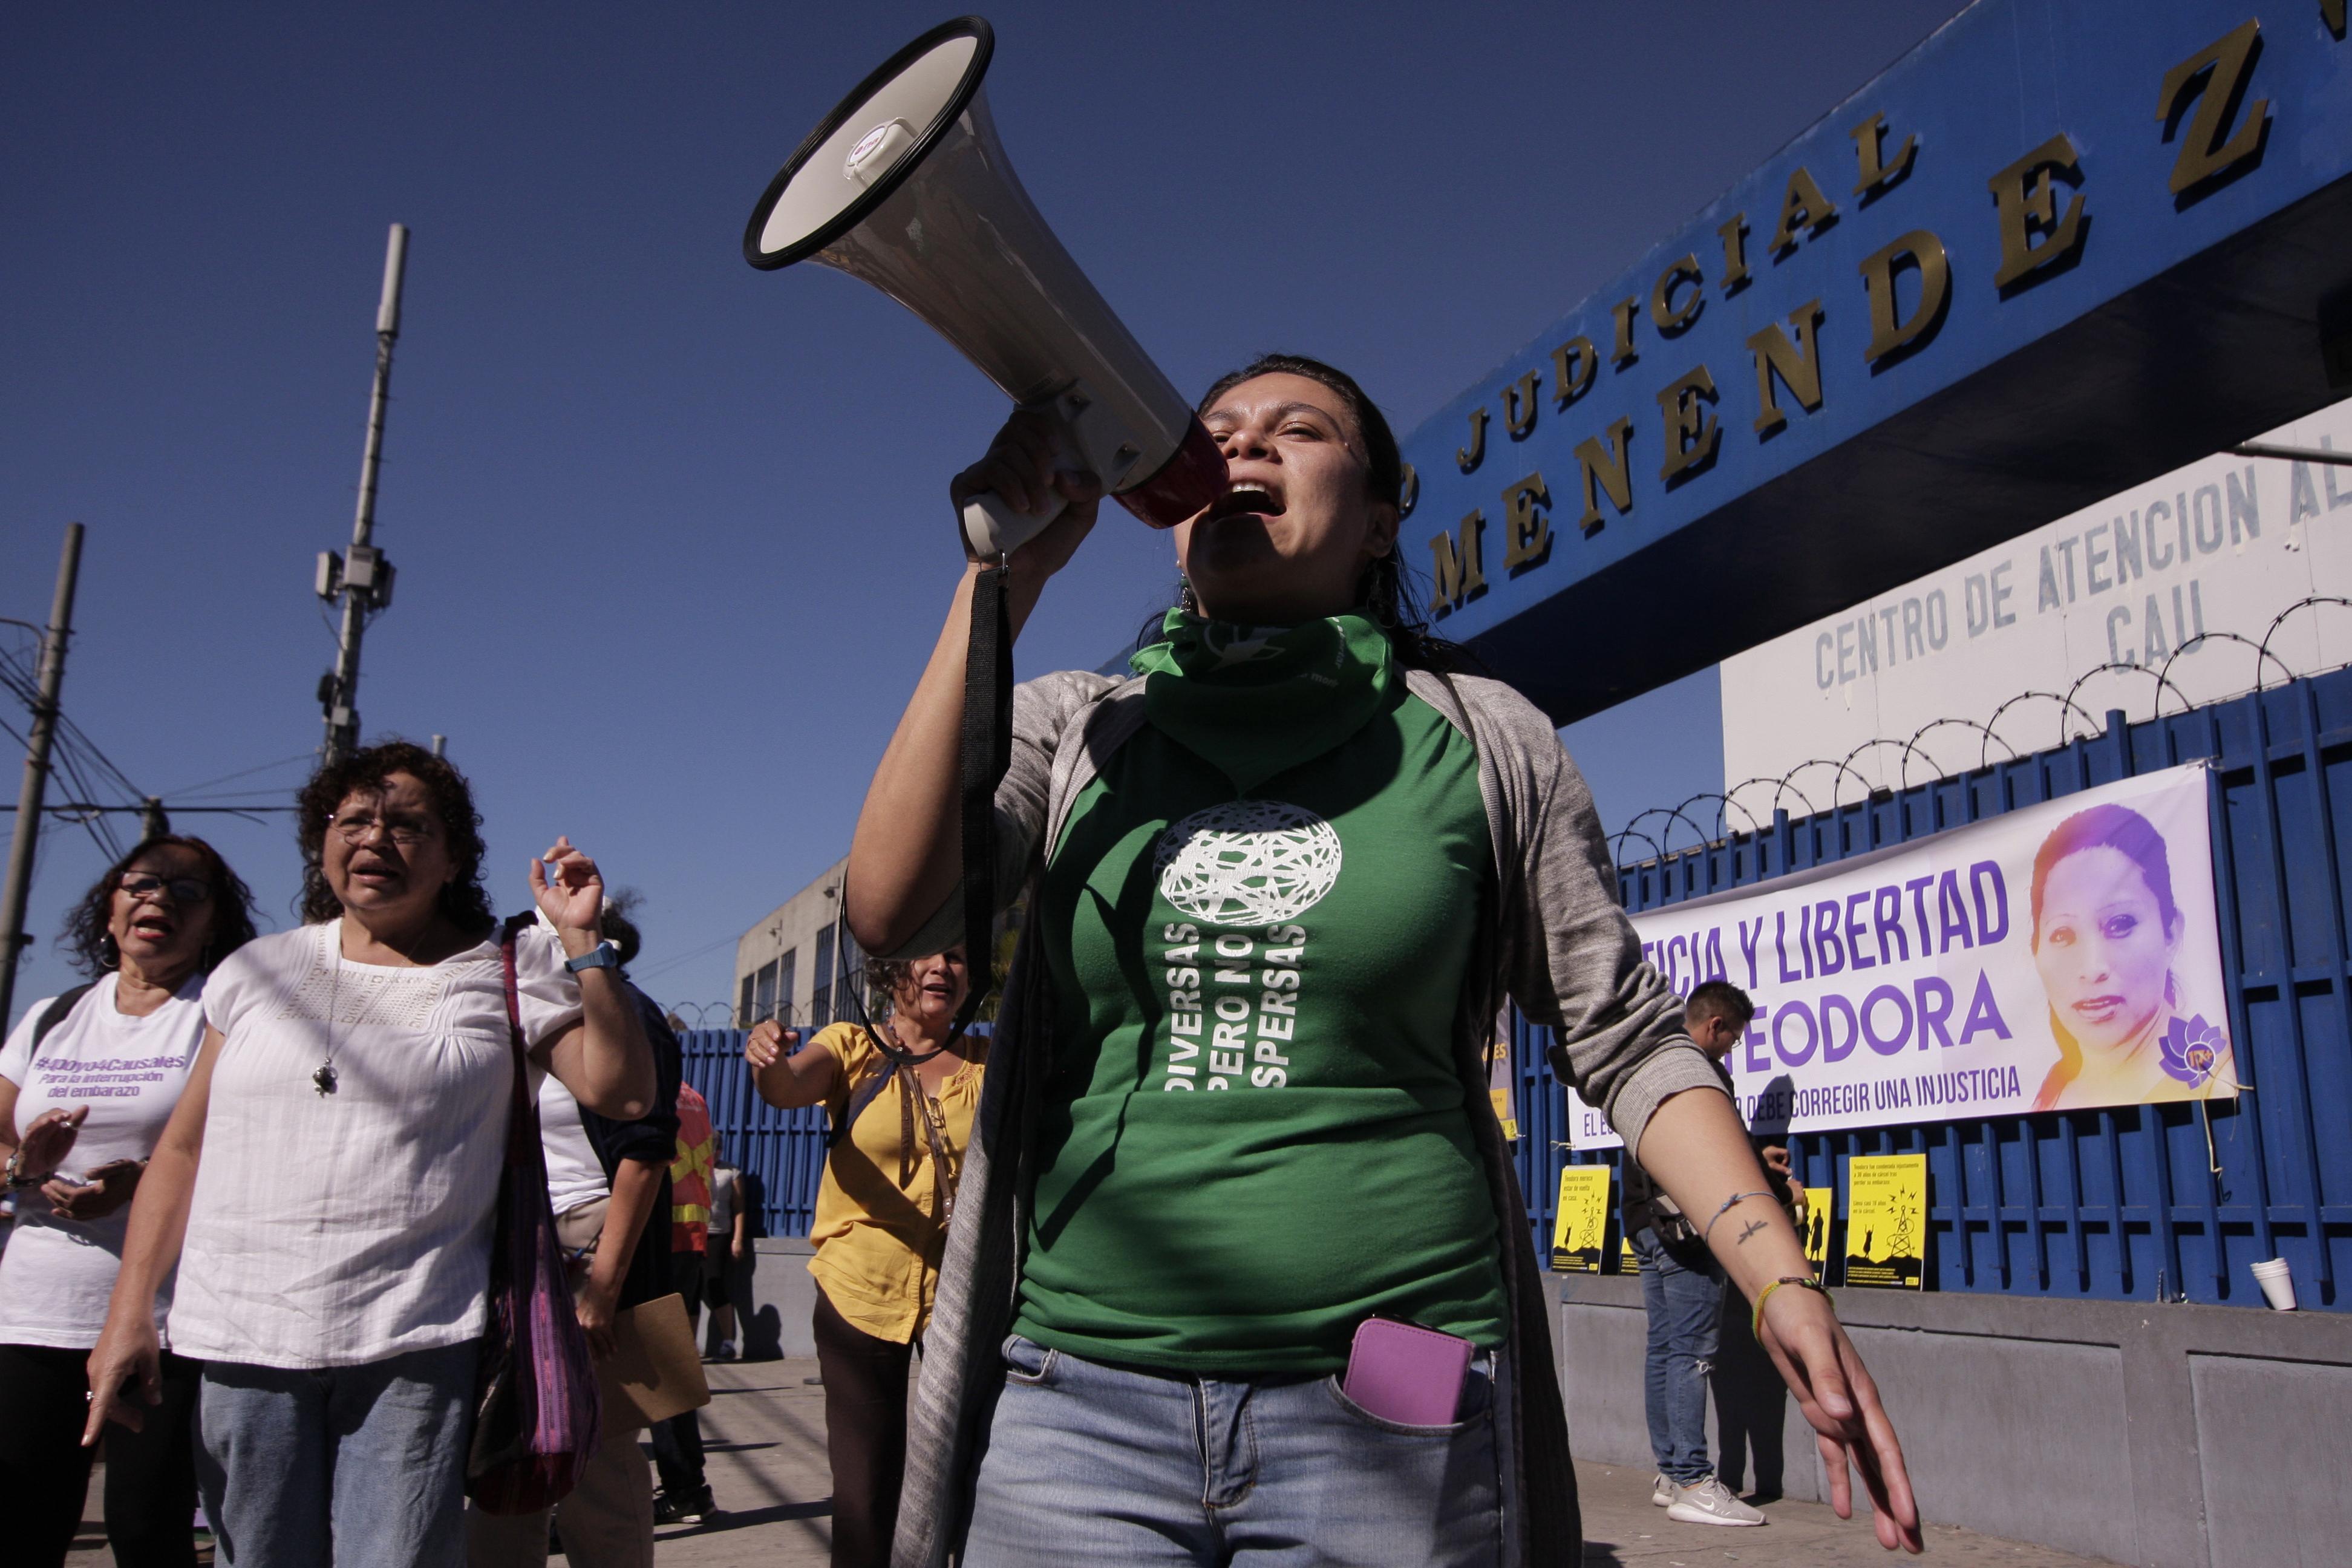 Protest mot abort motte protester